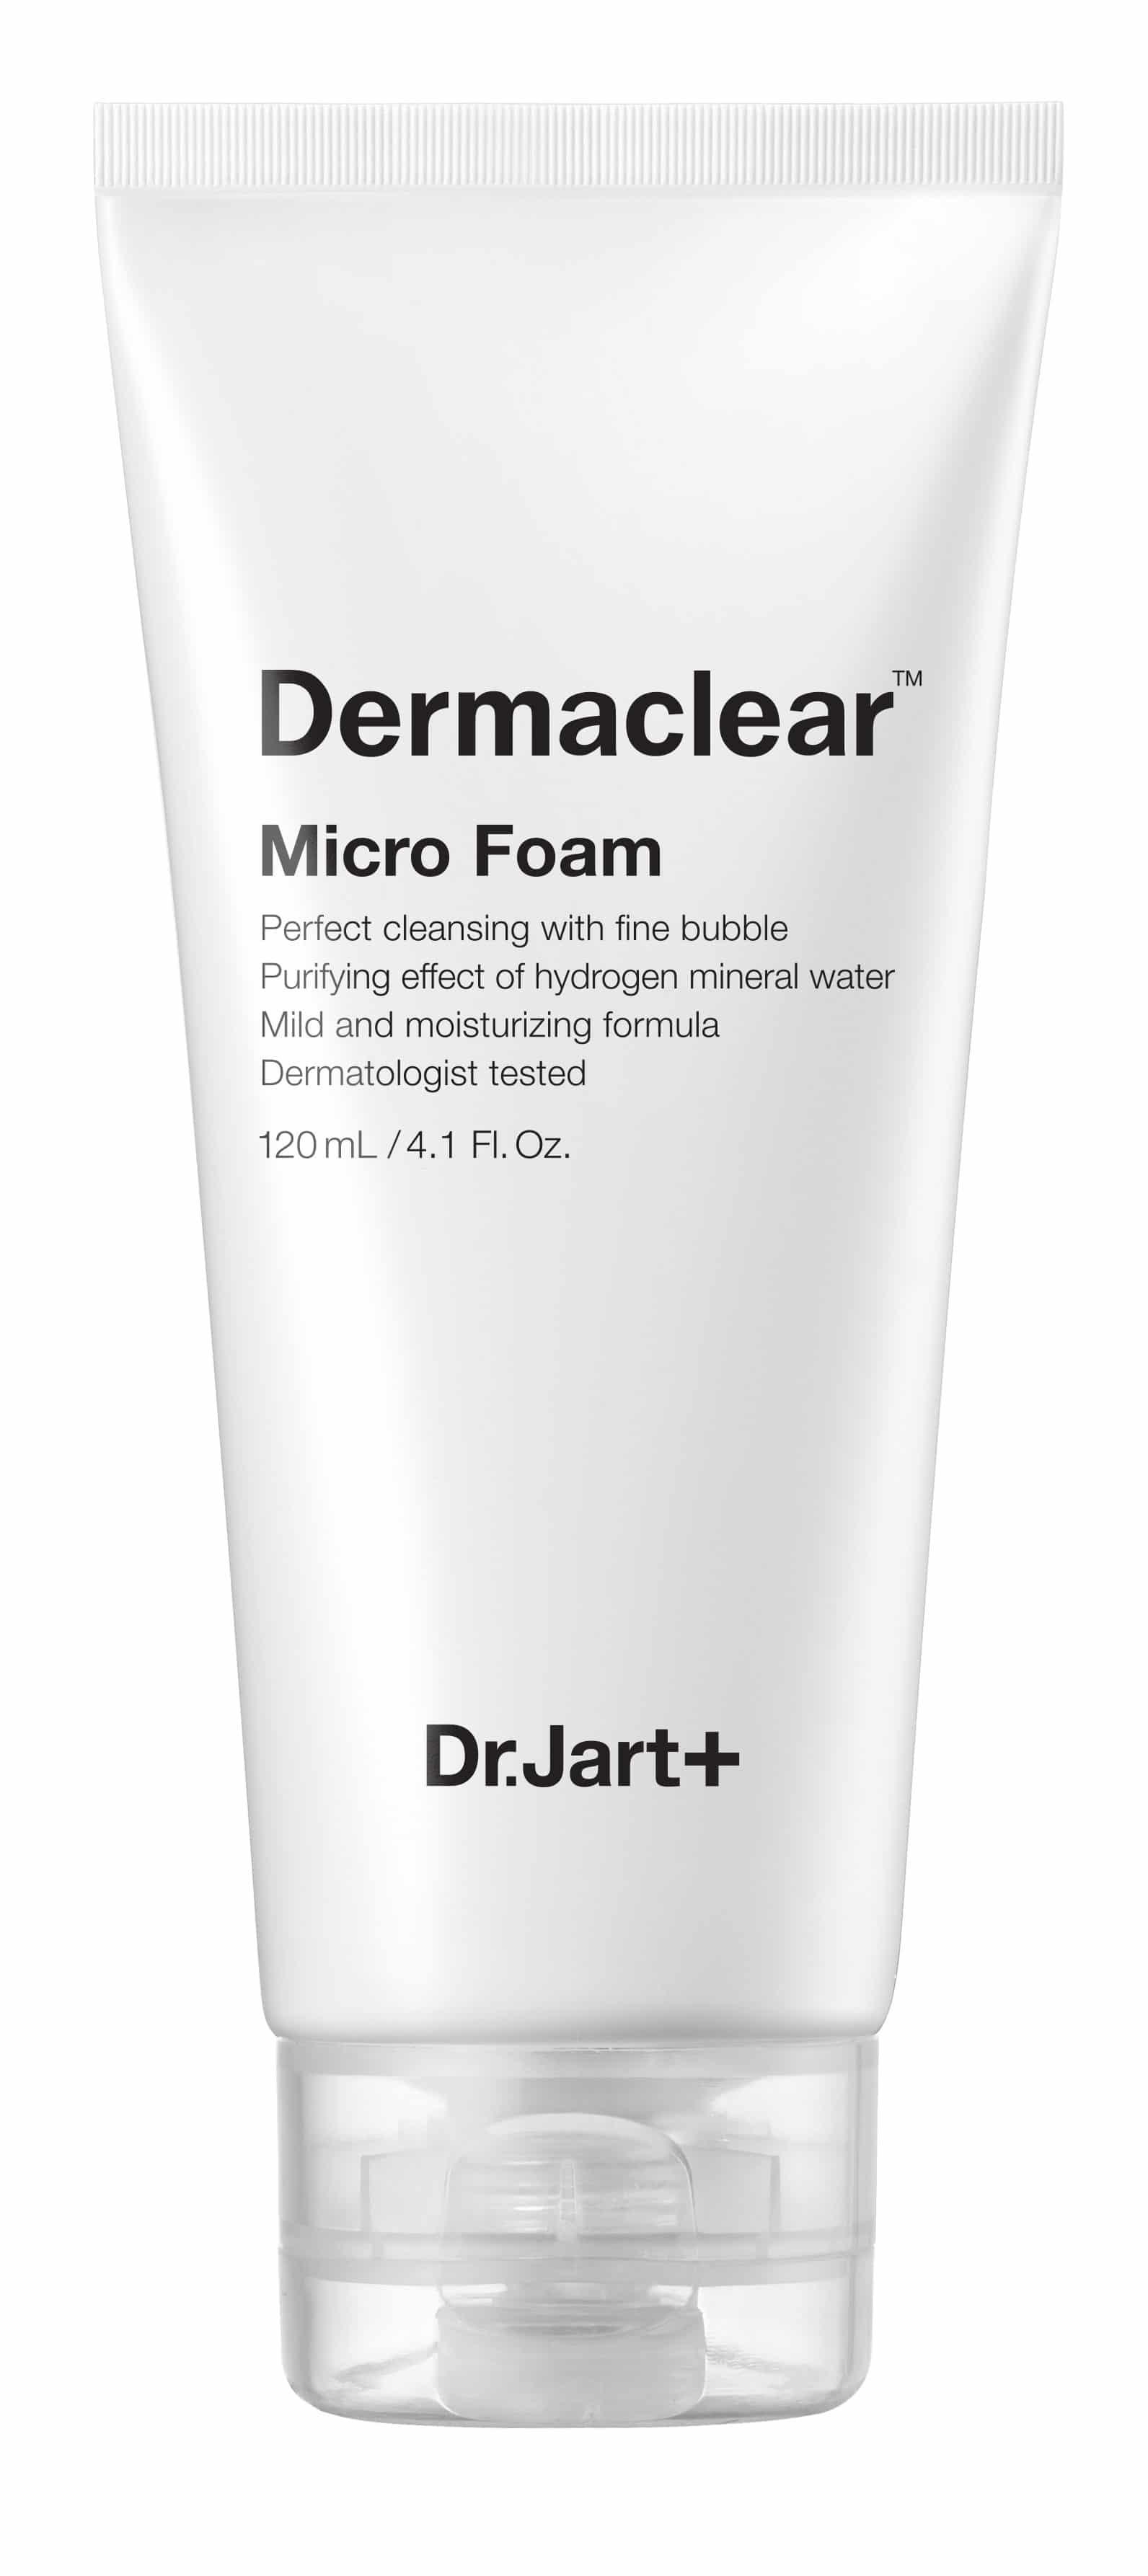 Dr. Jart Dermaclear Micro Foam: la mousse detergente ipoallergenica